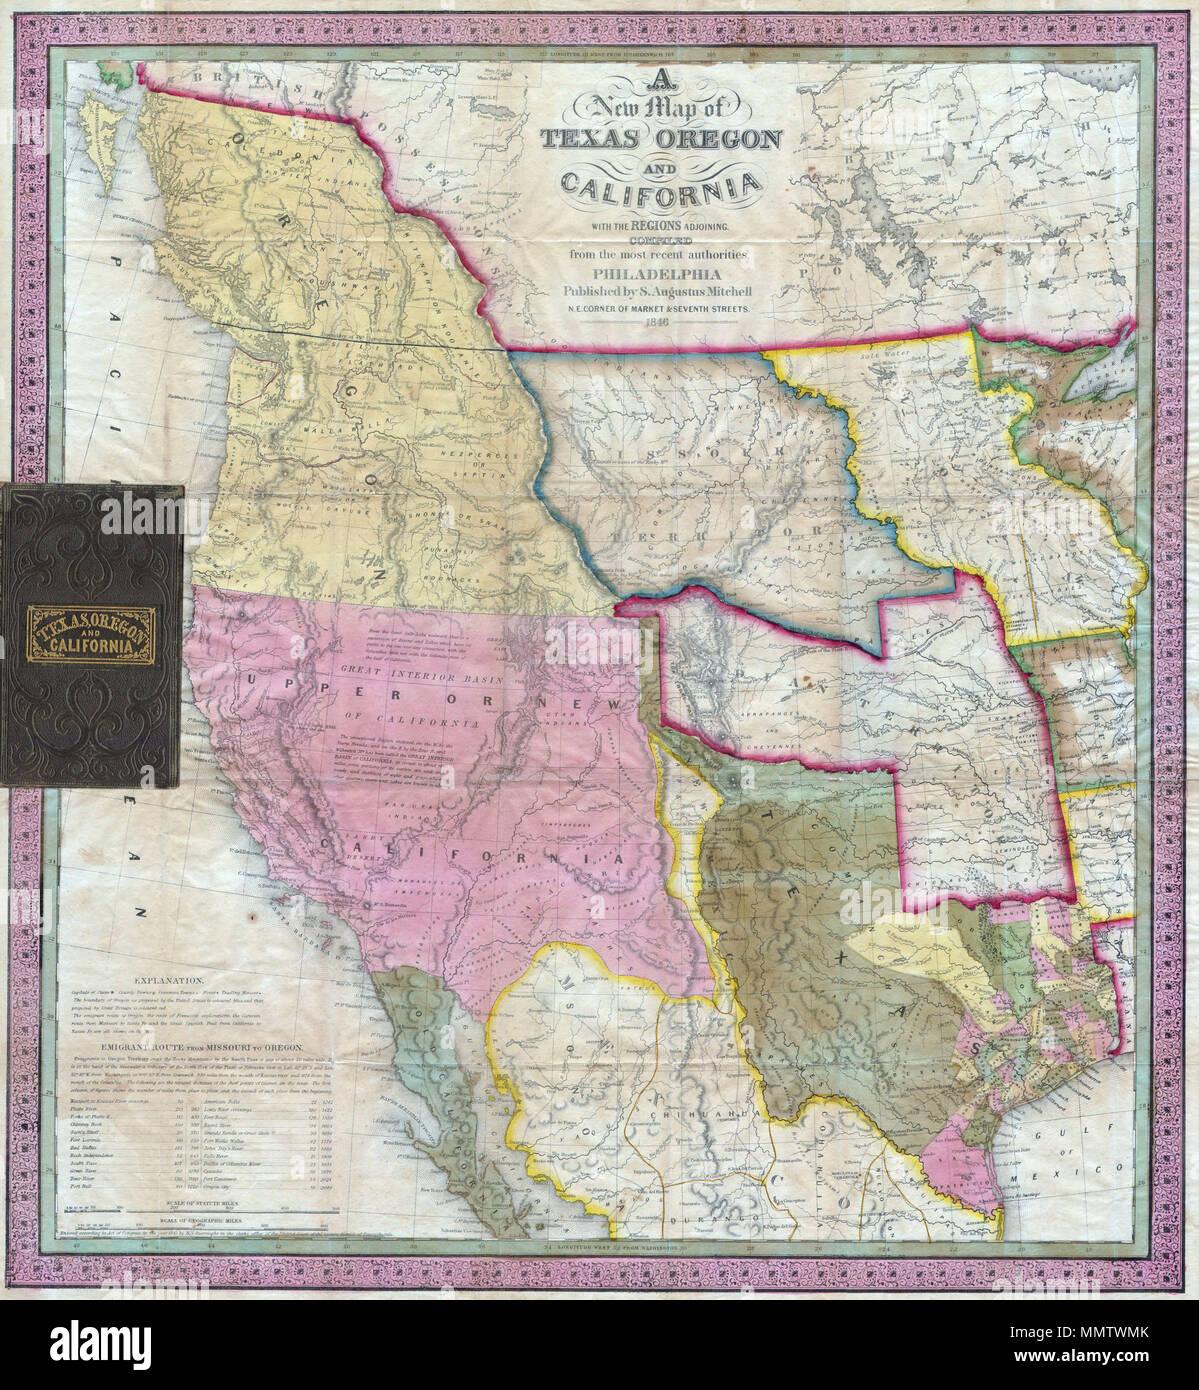 Indian Territory Map Oklahoma Stock Photos Indian Territory Map - Us-indian-territory-map